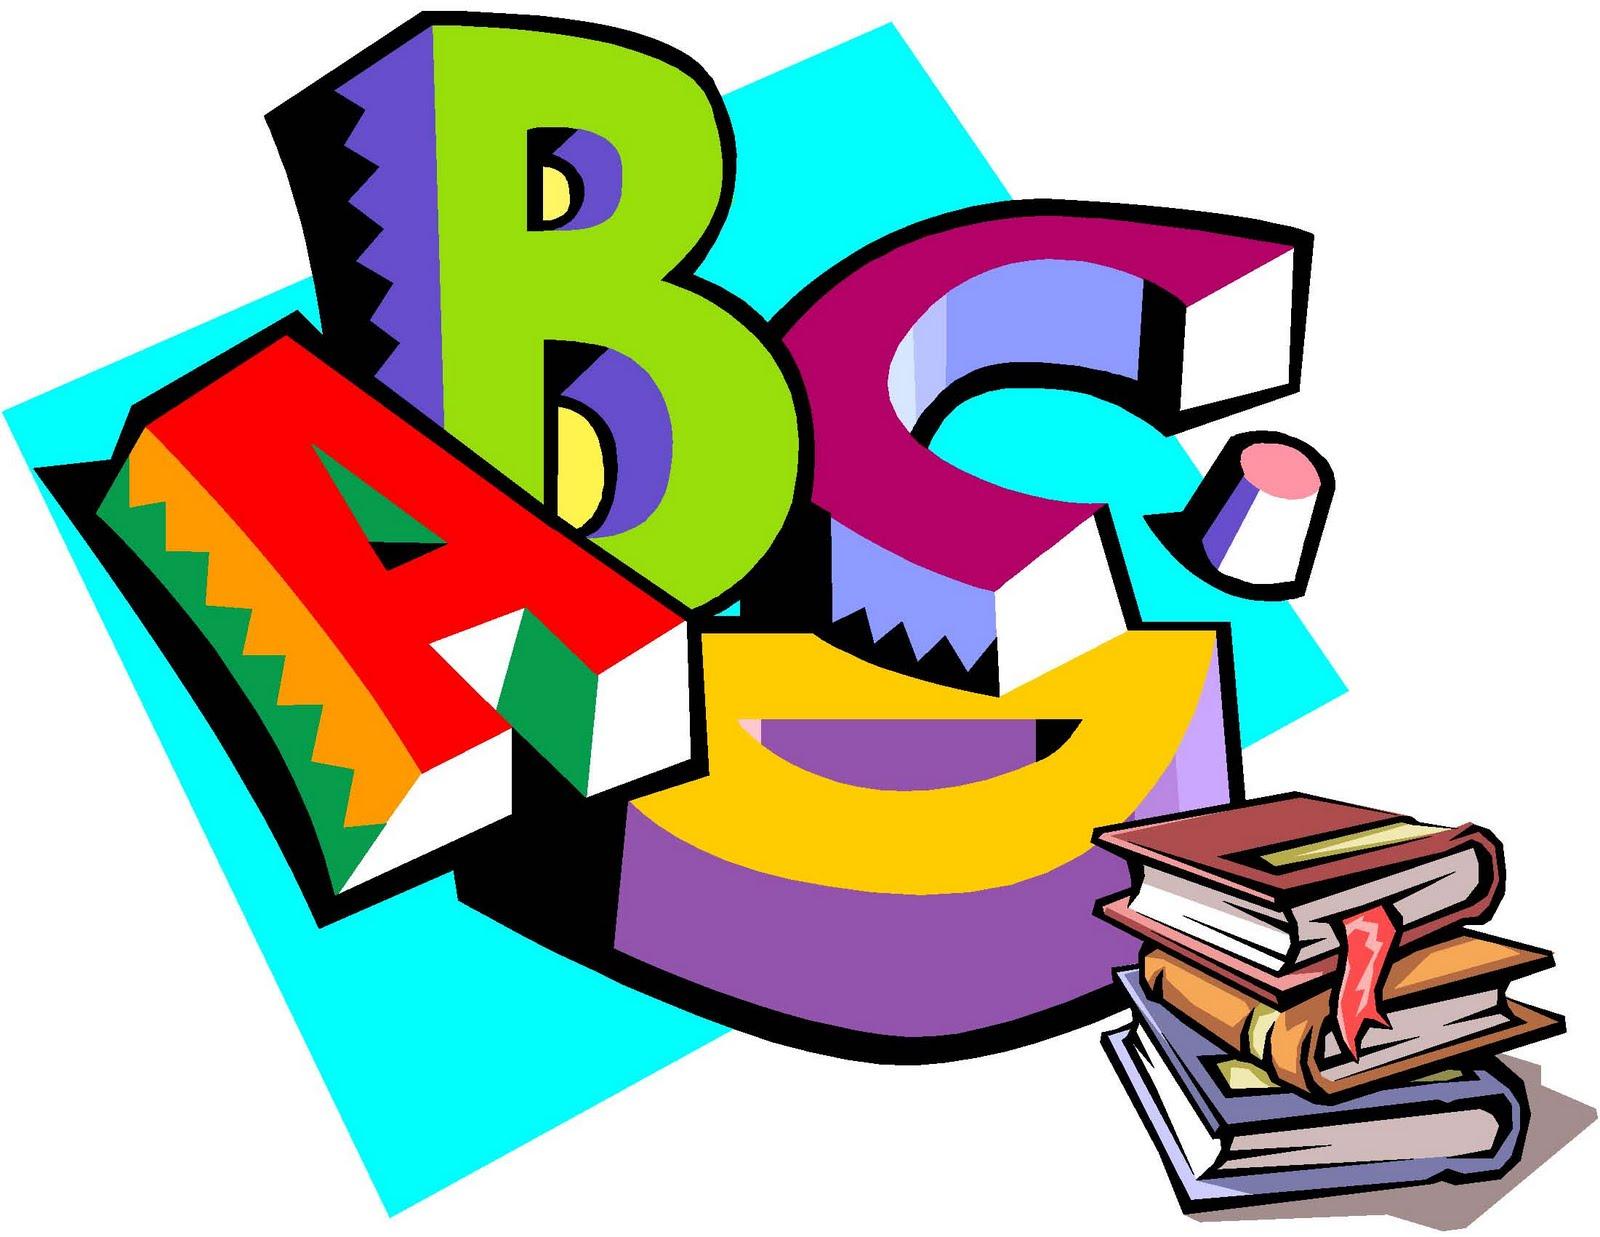 English Language Arts Clip Art free image.